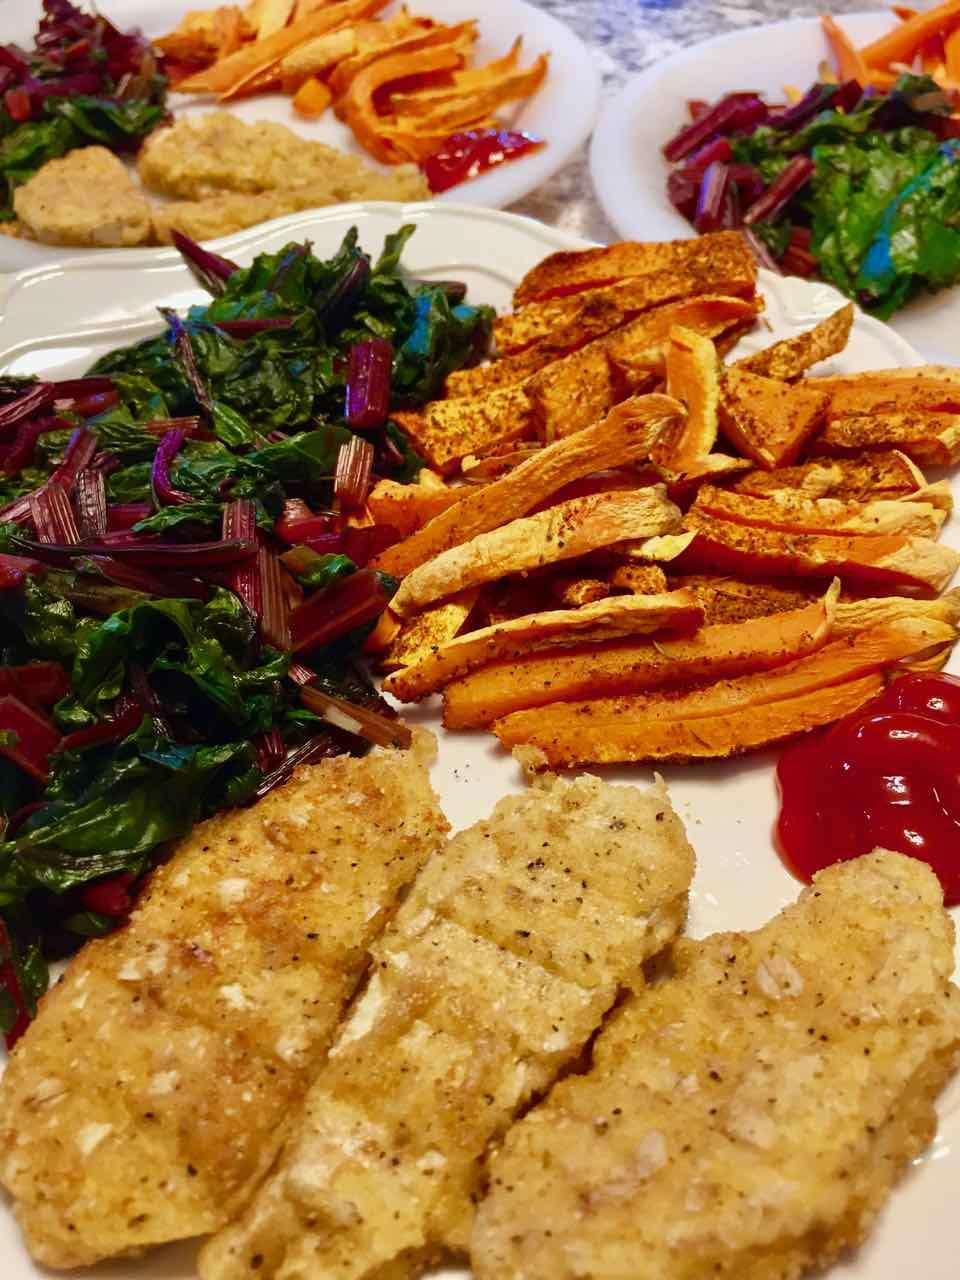 cajun sweet potato oven fries with ketchup